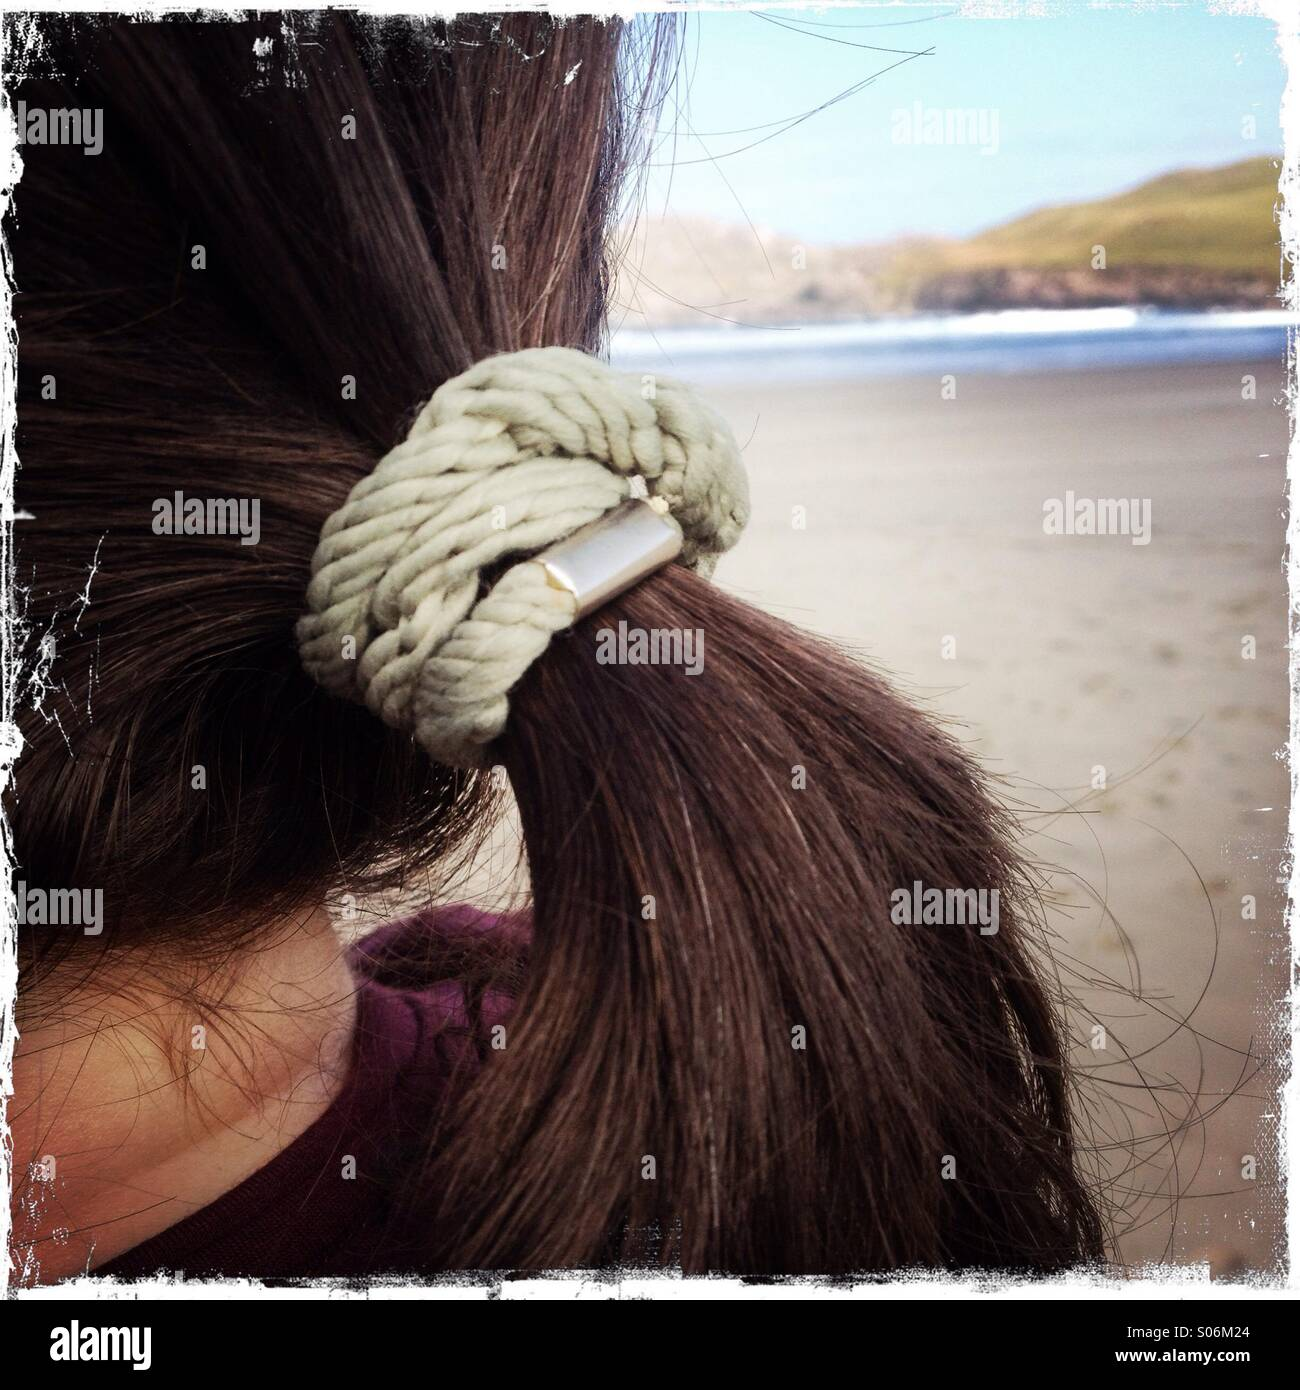 Ponytail - Stock Image